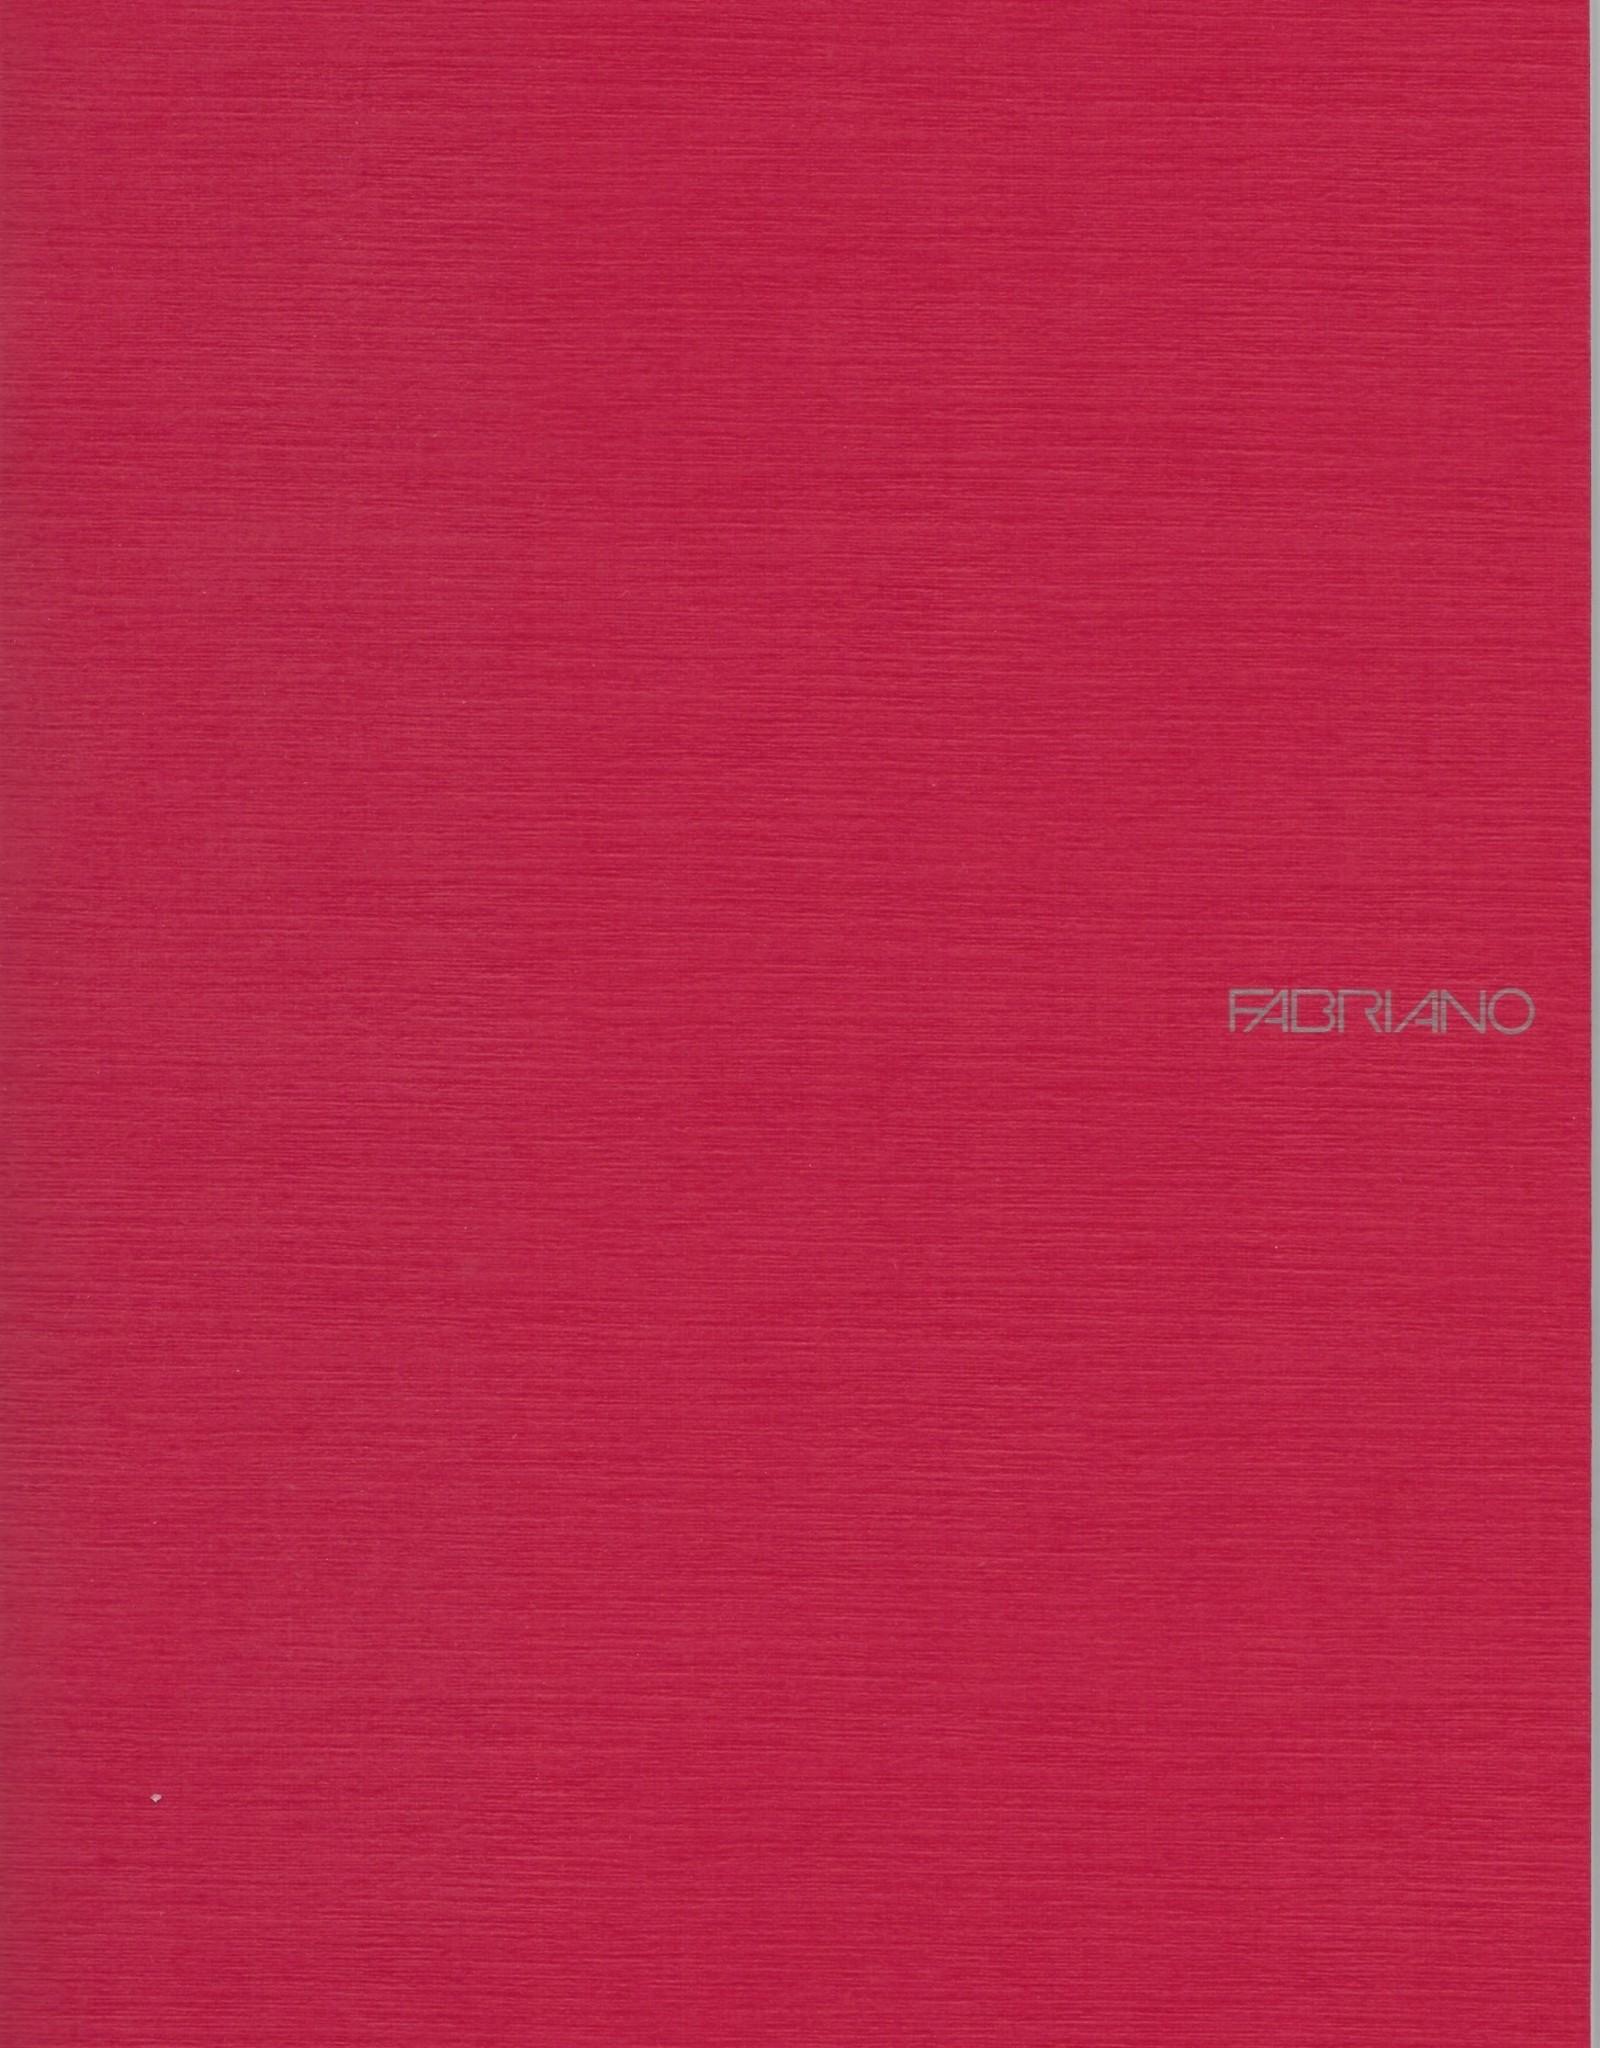 "Fabriano EcoQua Blank Notebook, Raspberry, 8.25"" x 11.5"" 40 Sheets"